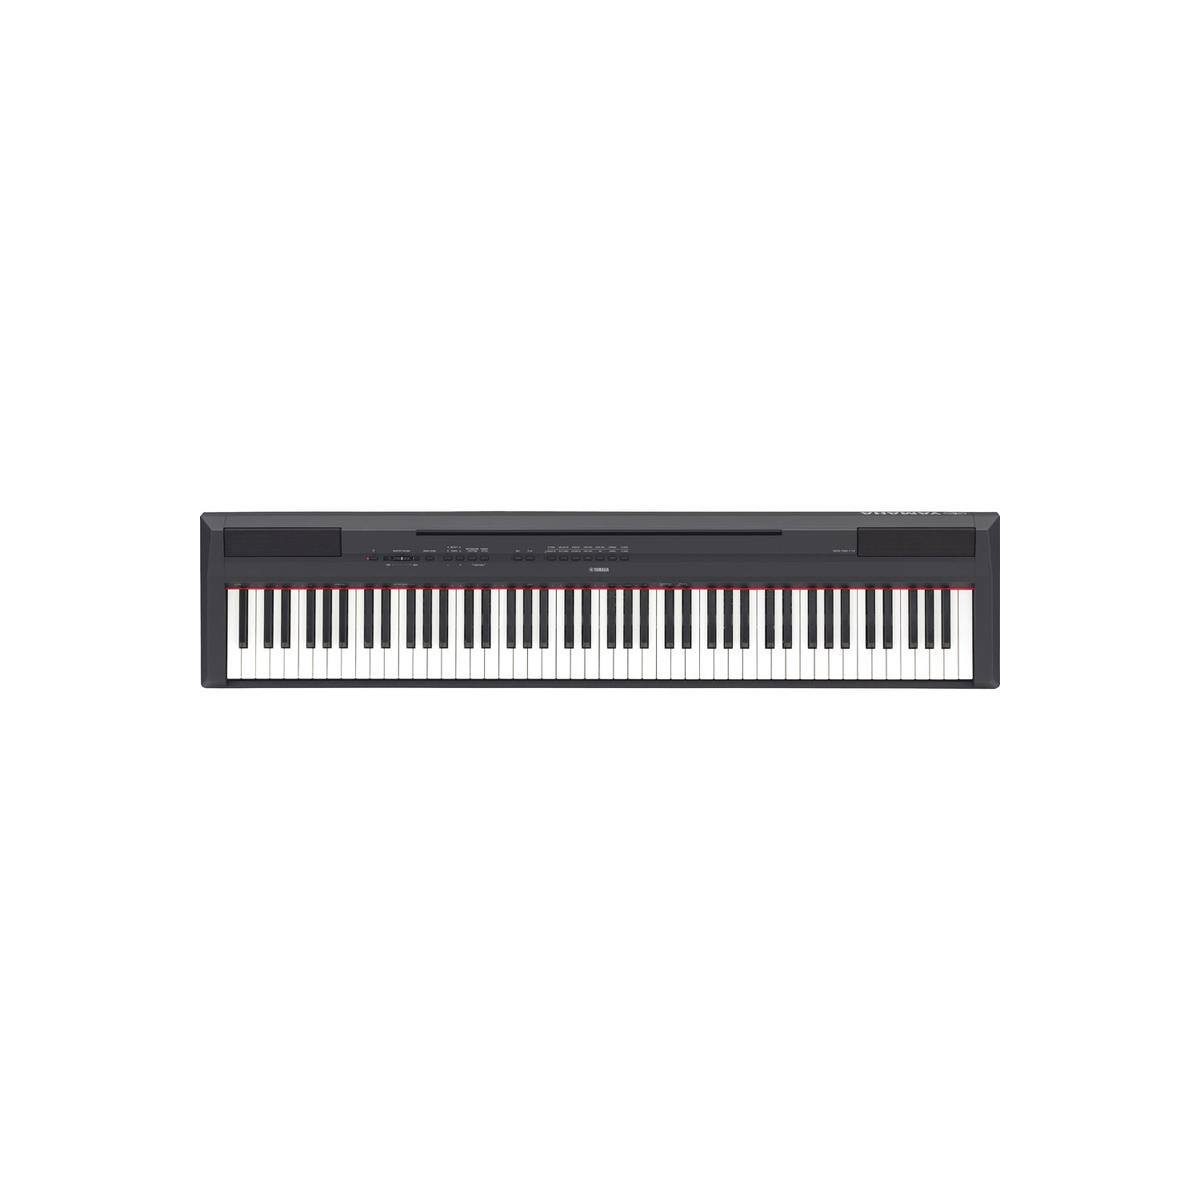 Yamaha P-115 88-Key Weighted Action Digital Piano $469 + free shipping